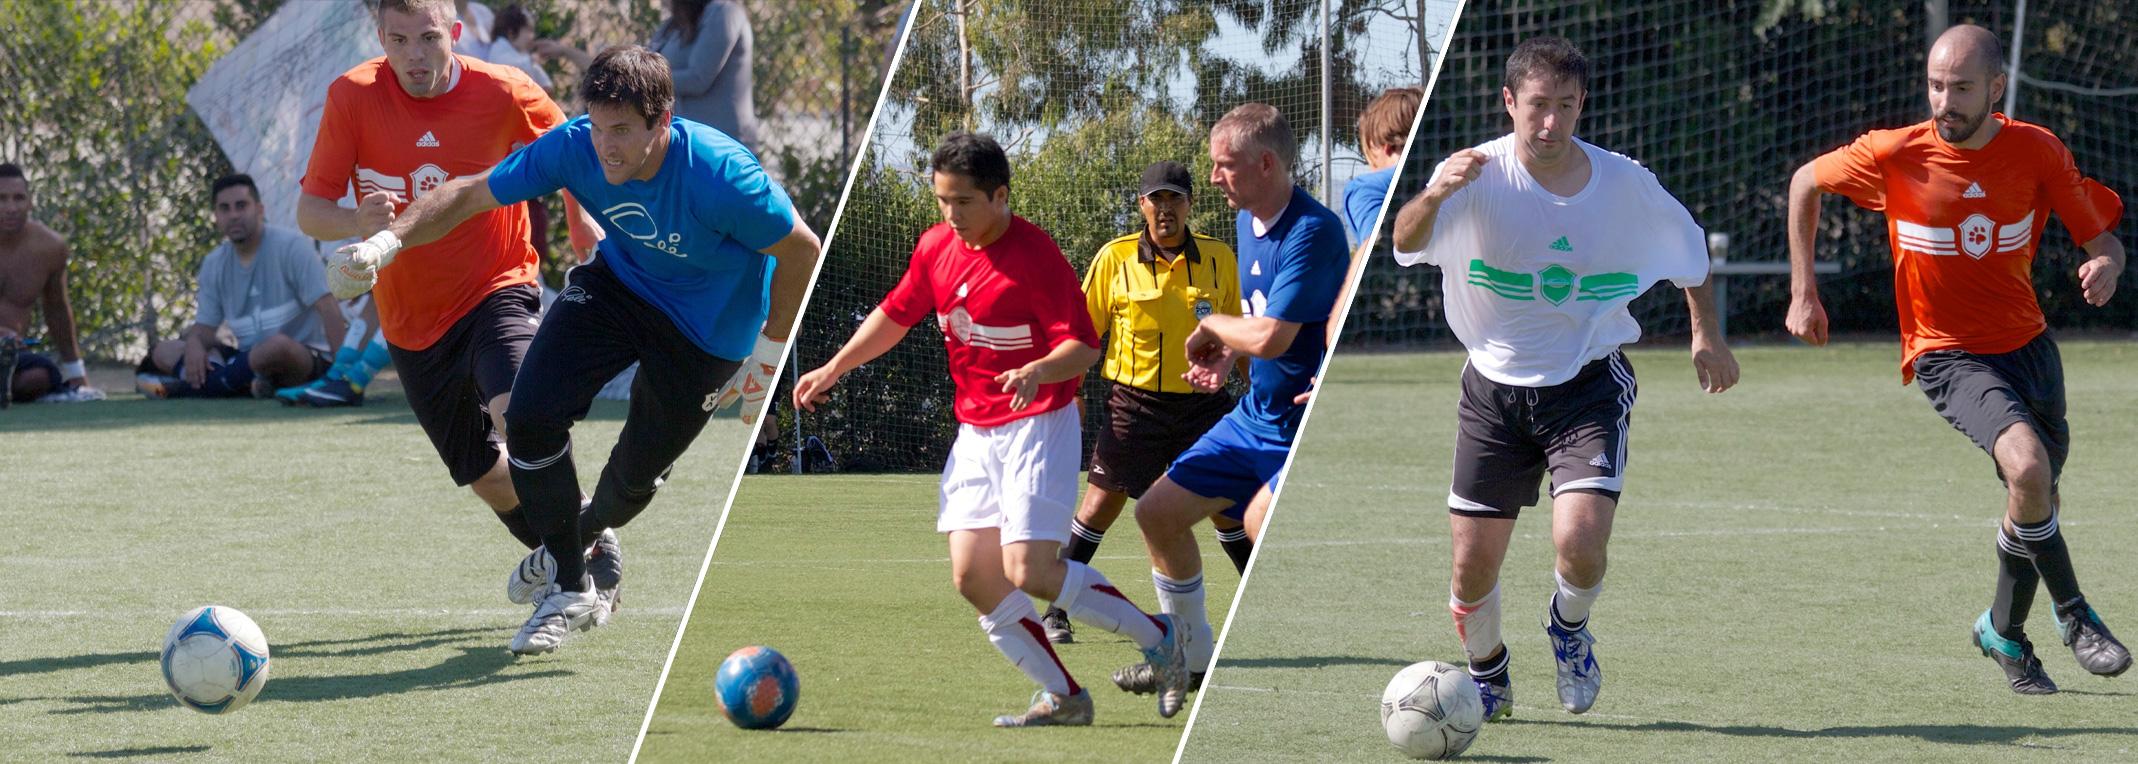 LA-Scores-Cup-TournamentHeader1.jpg